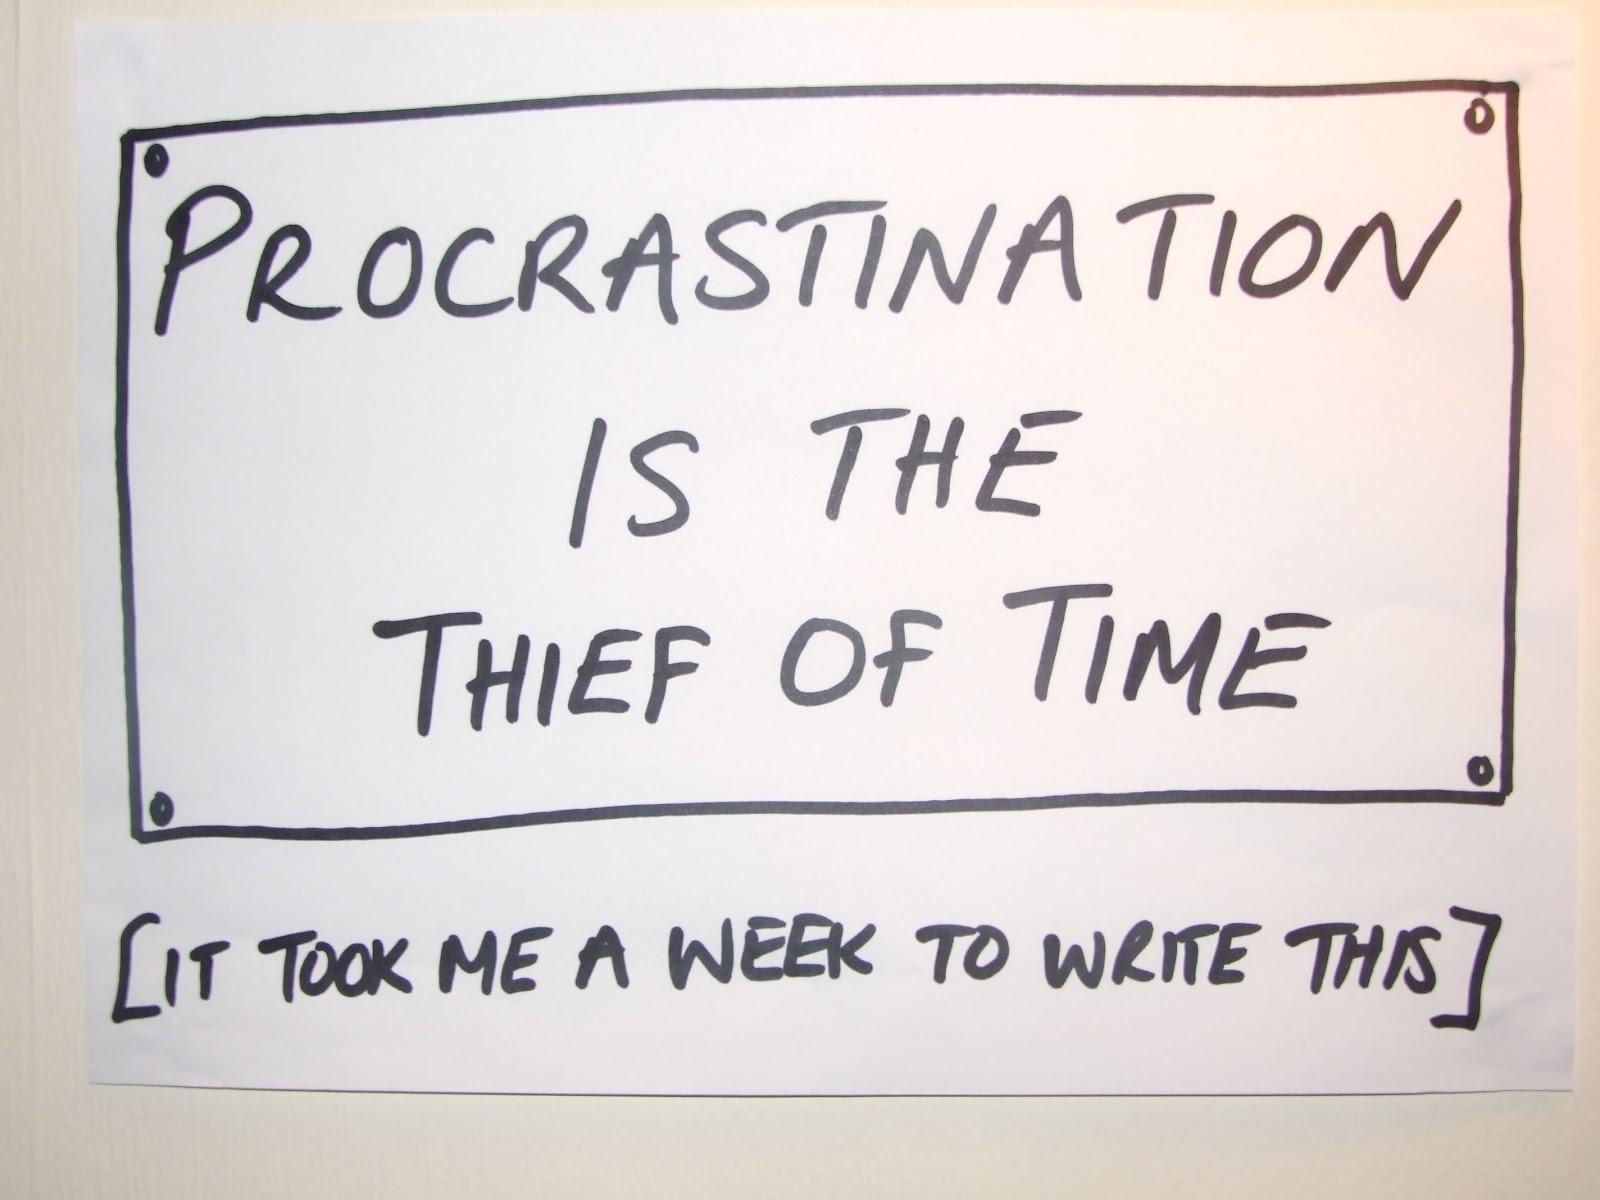 procrastination essays persuasive essay about procrastination  the thief of time philosophical essays on procrastination order the thief of time philosophical essays on